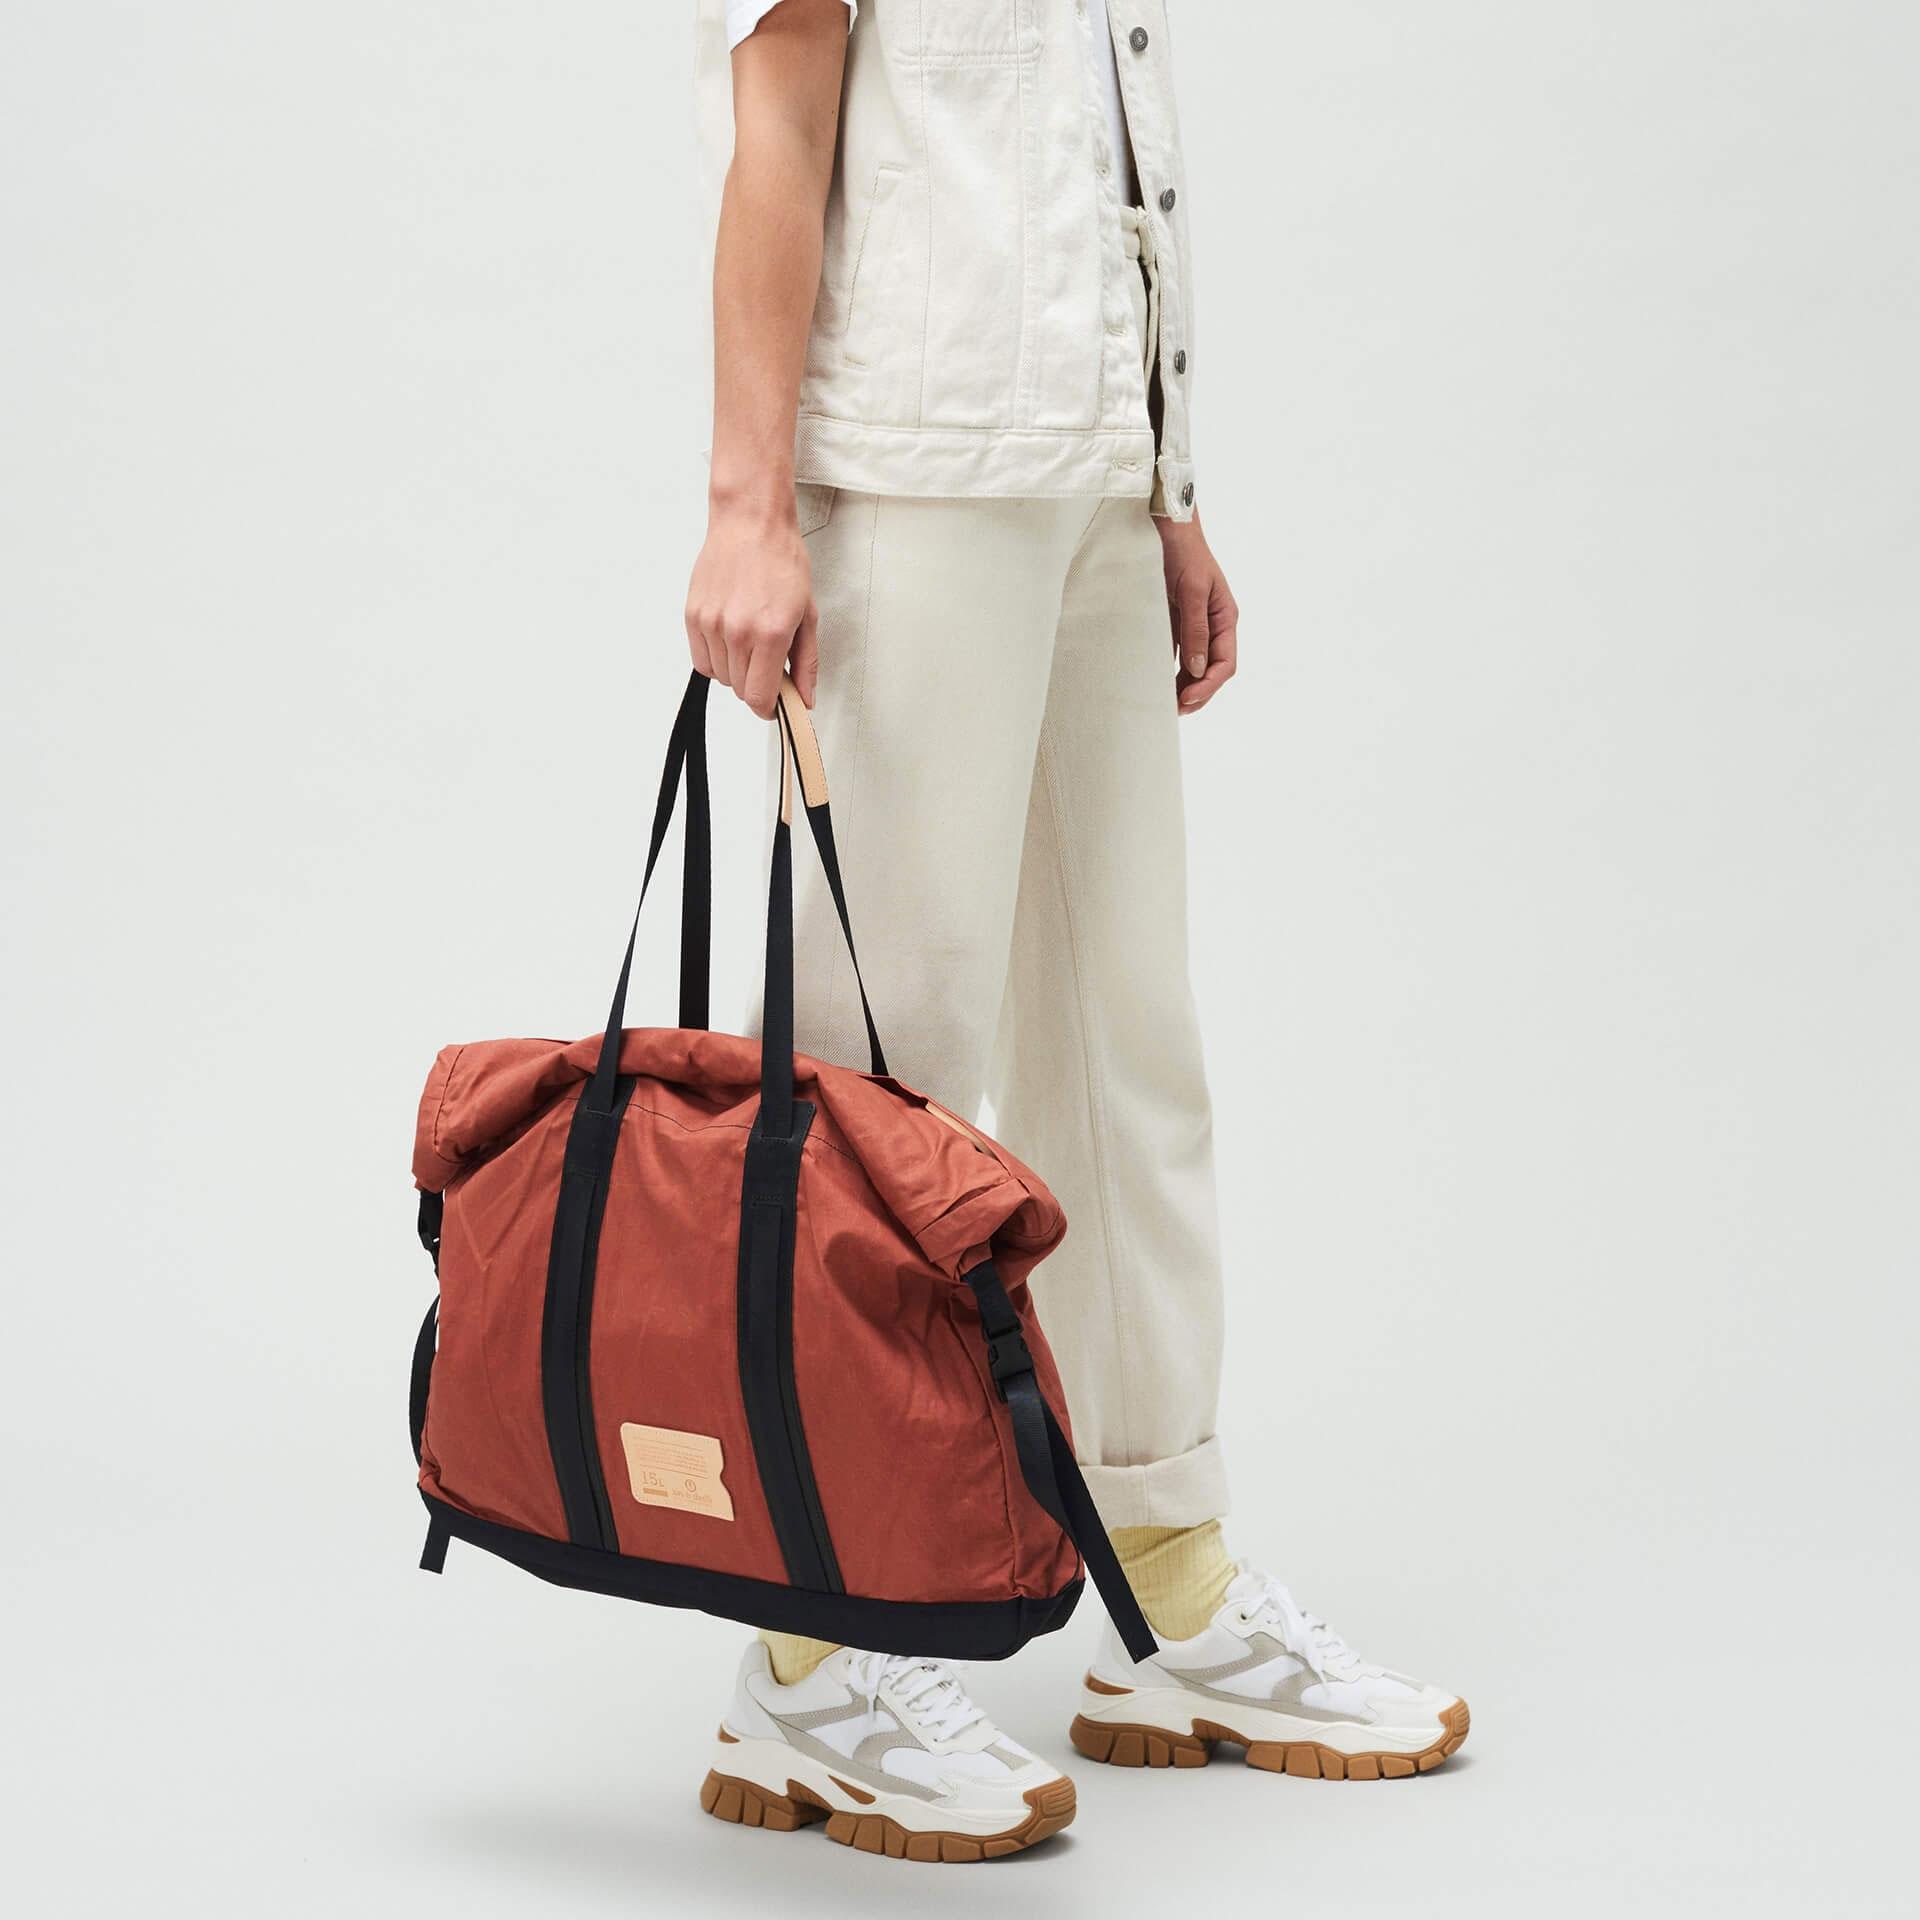 15L Barda Tote bag - Burgundy (image n°5)